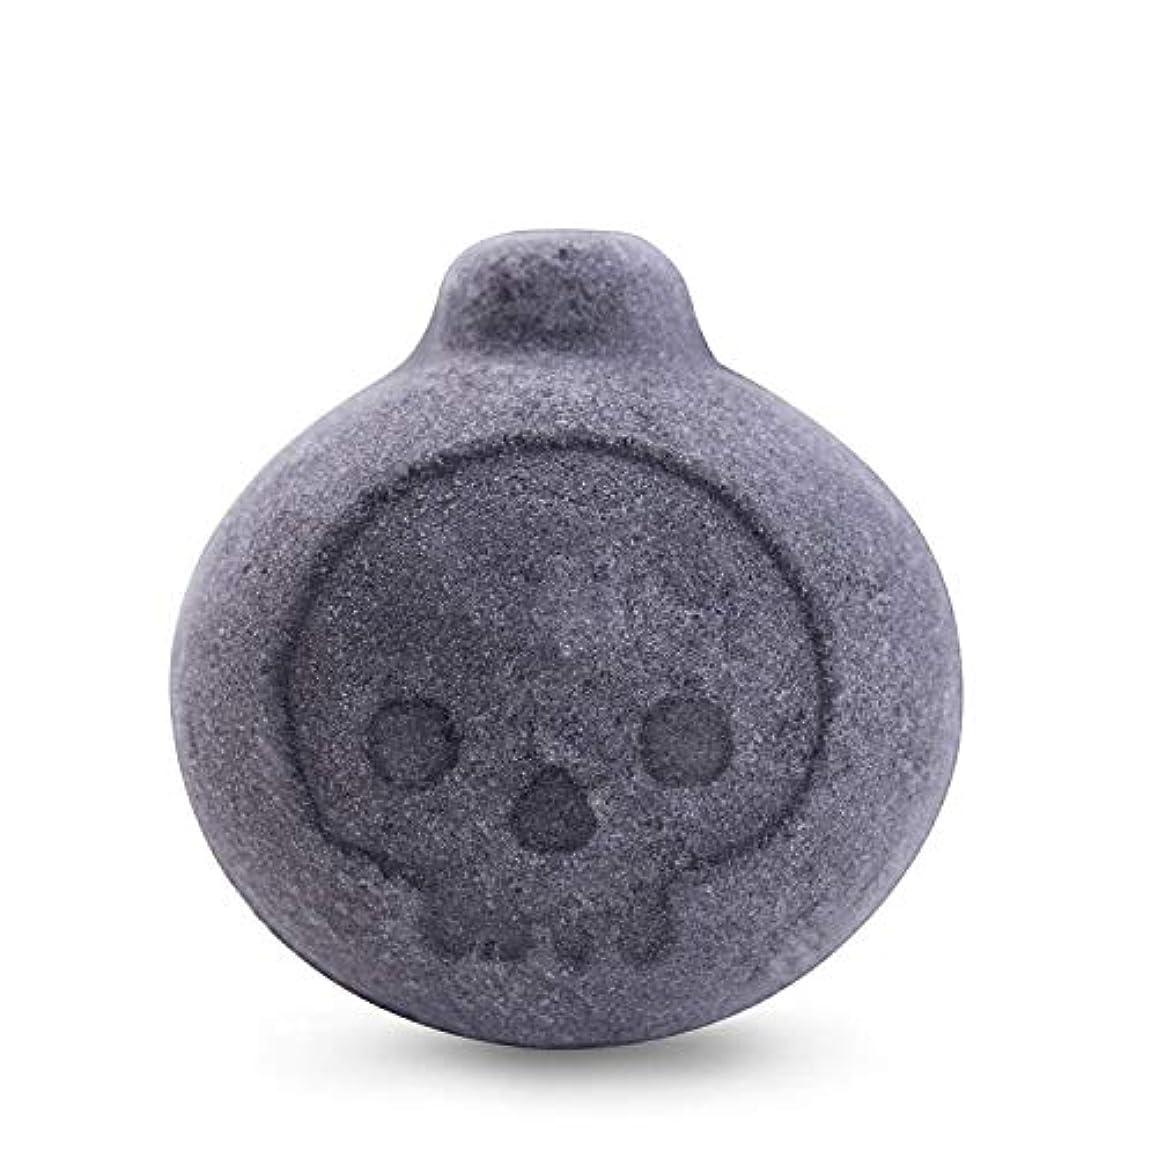 Dyfina ブラックバス爆弾、活性炭ィセット - バブルとスパバスに最適, 12 x 1.6 oz (爆弾)